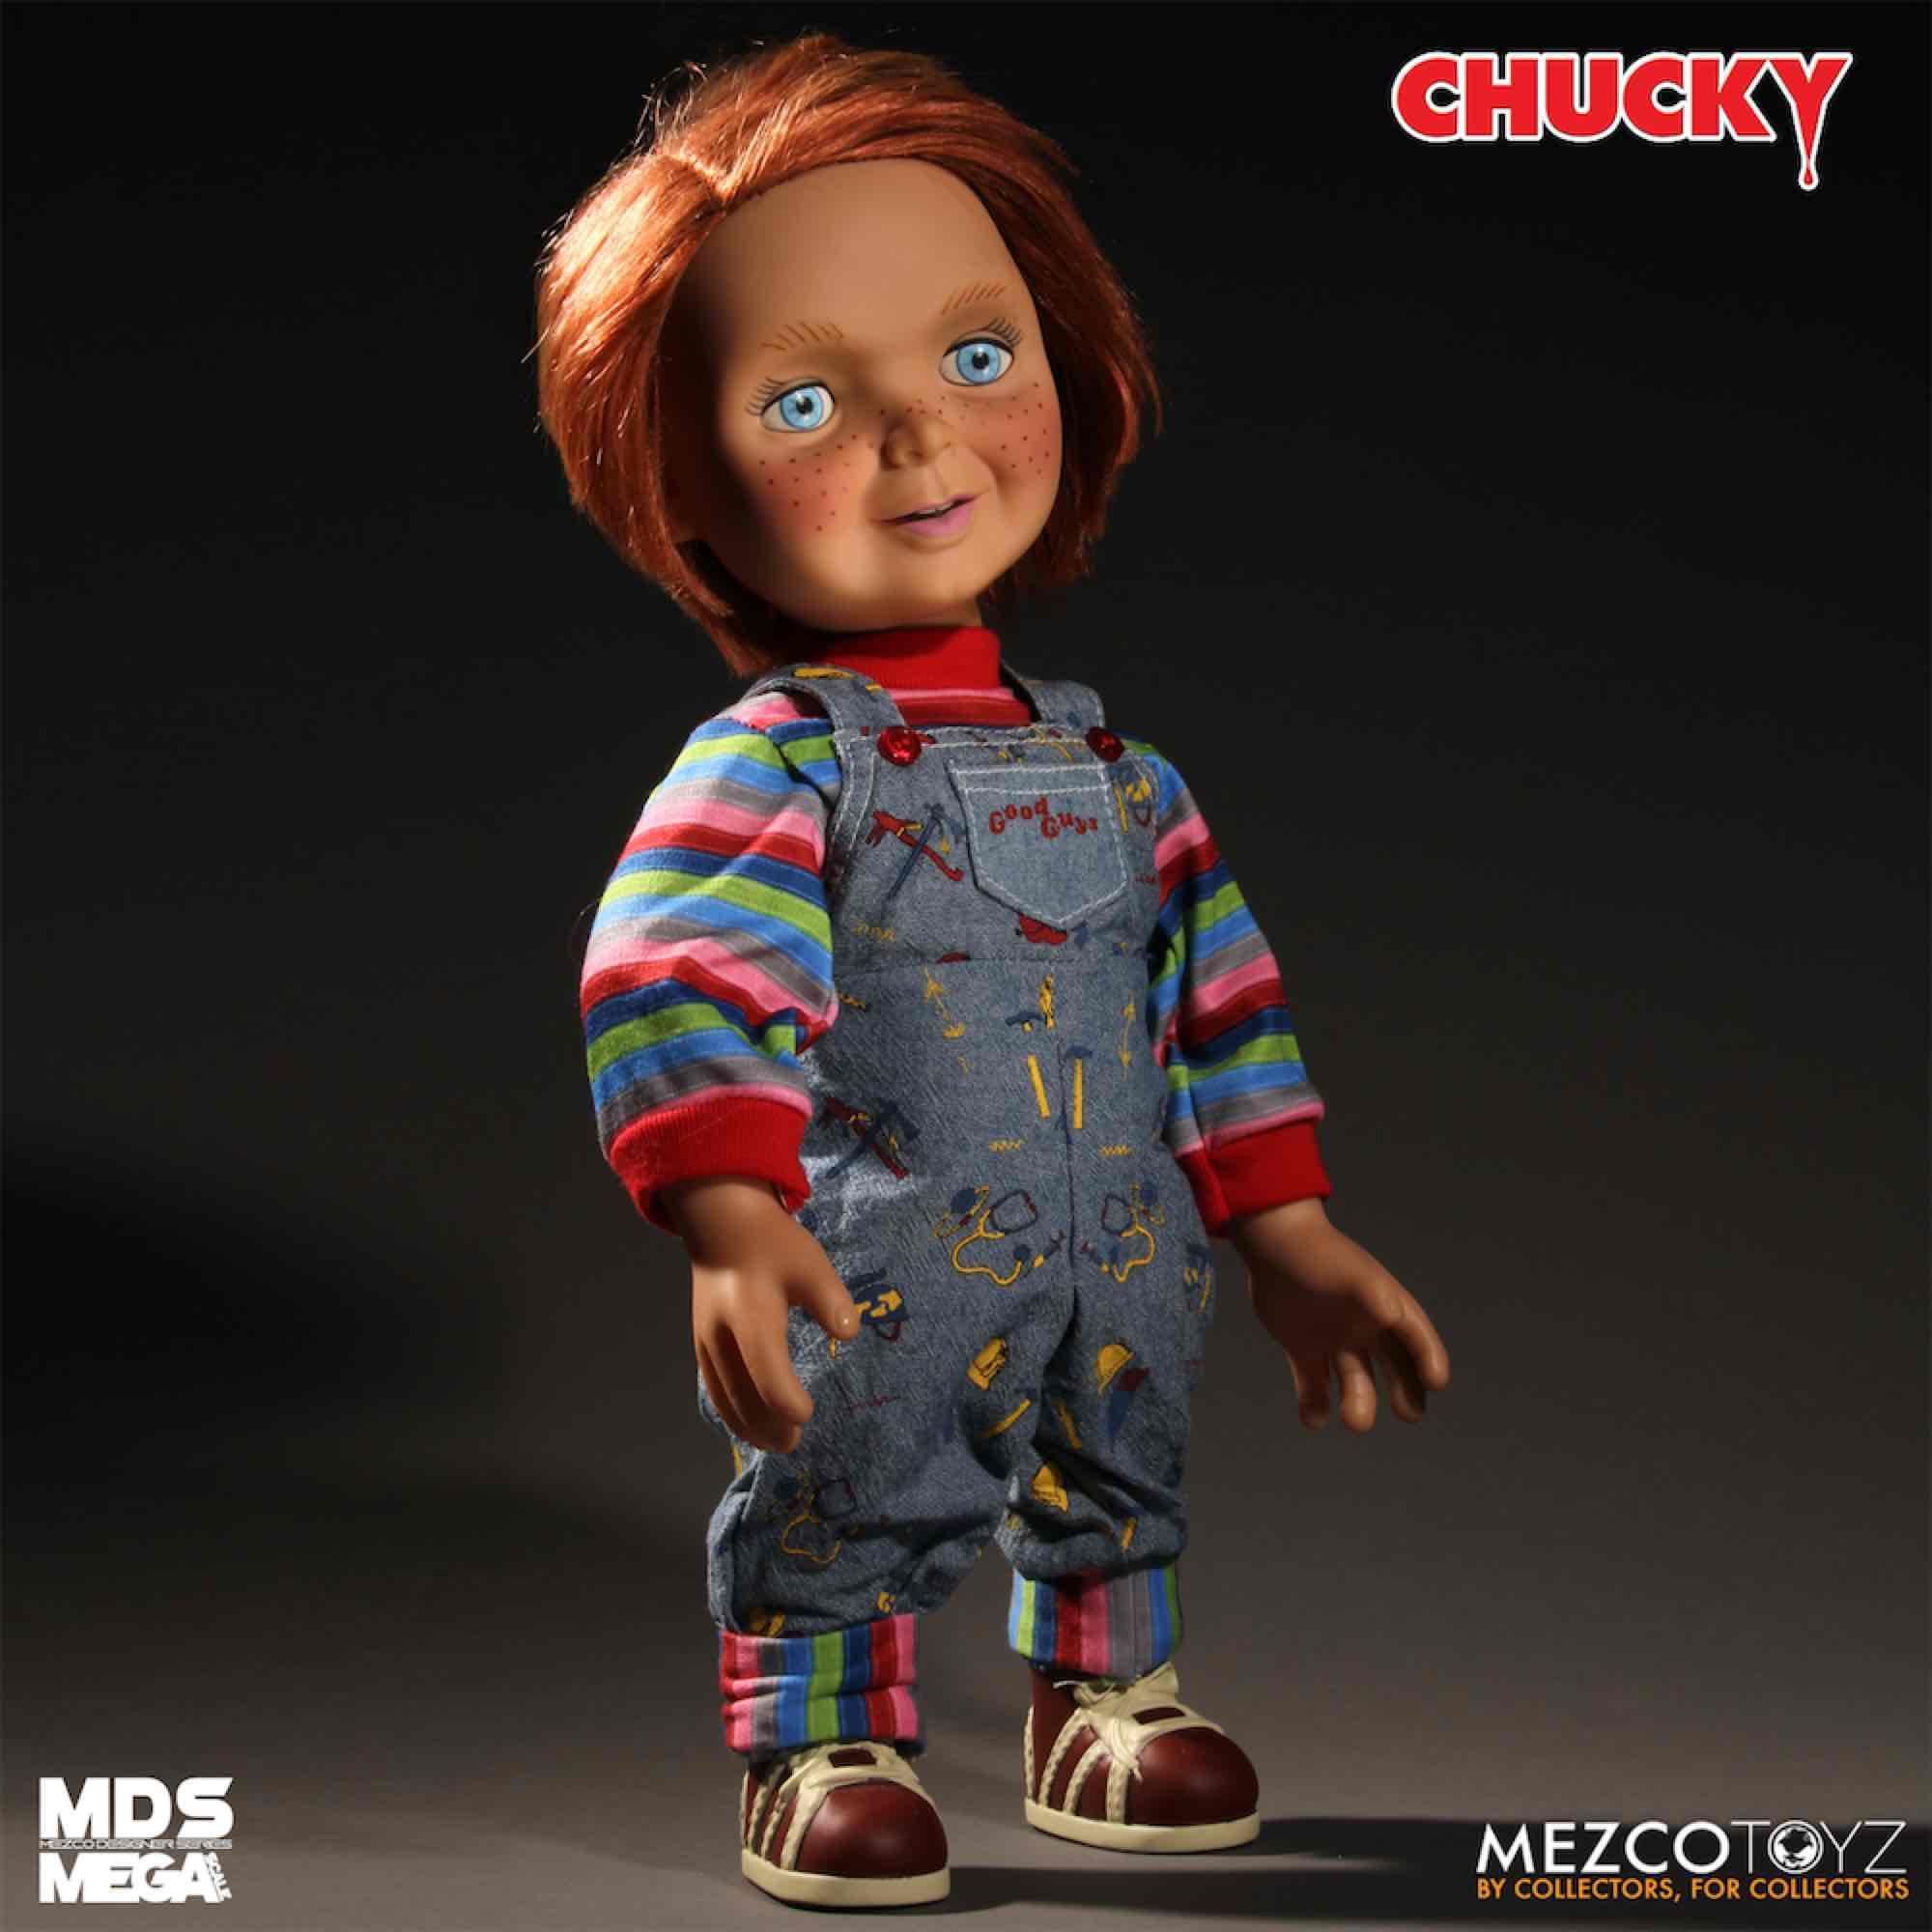 CHUCKY MUÑECO HAPPY FACE CON VOZ 38 CM GOOD GUY